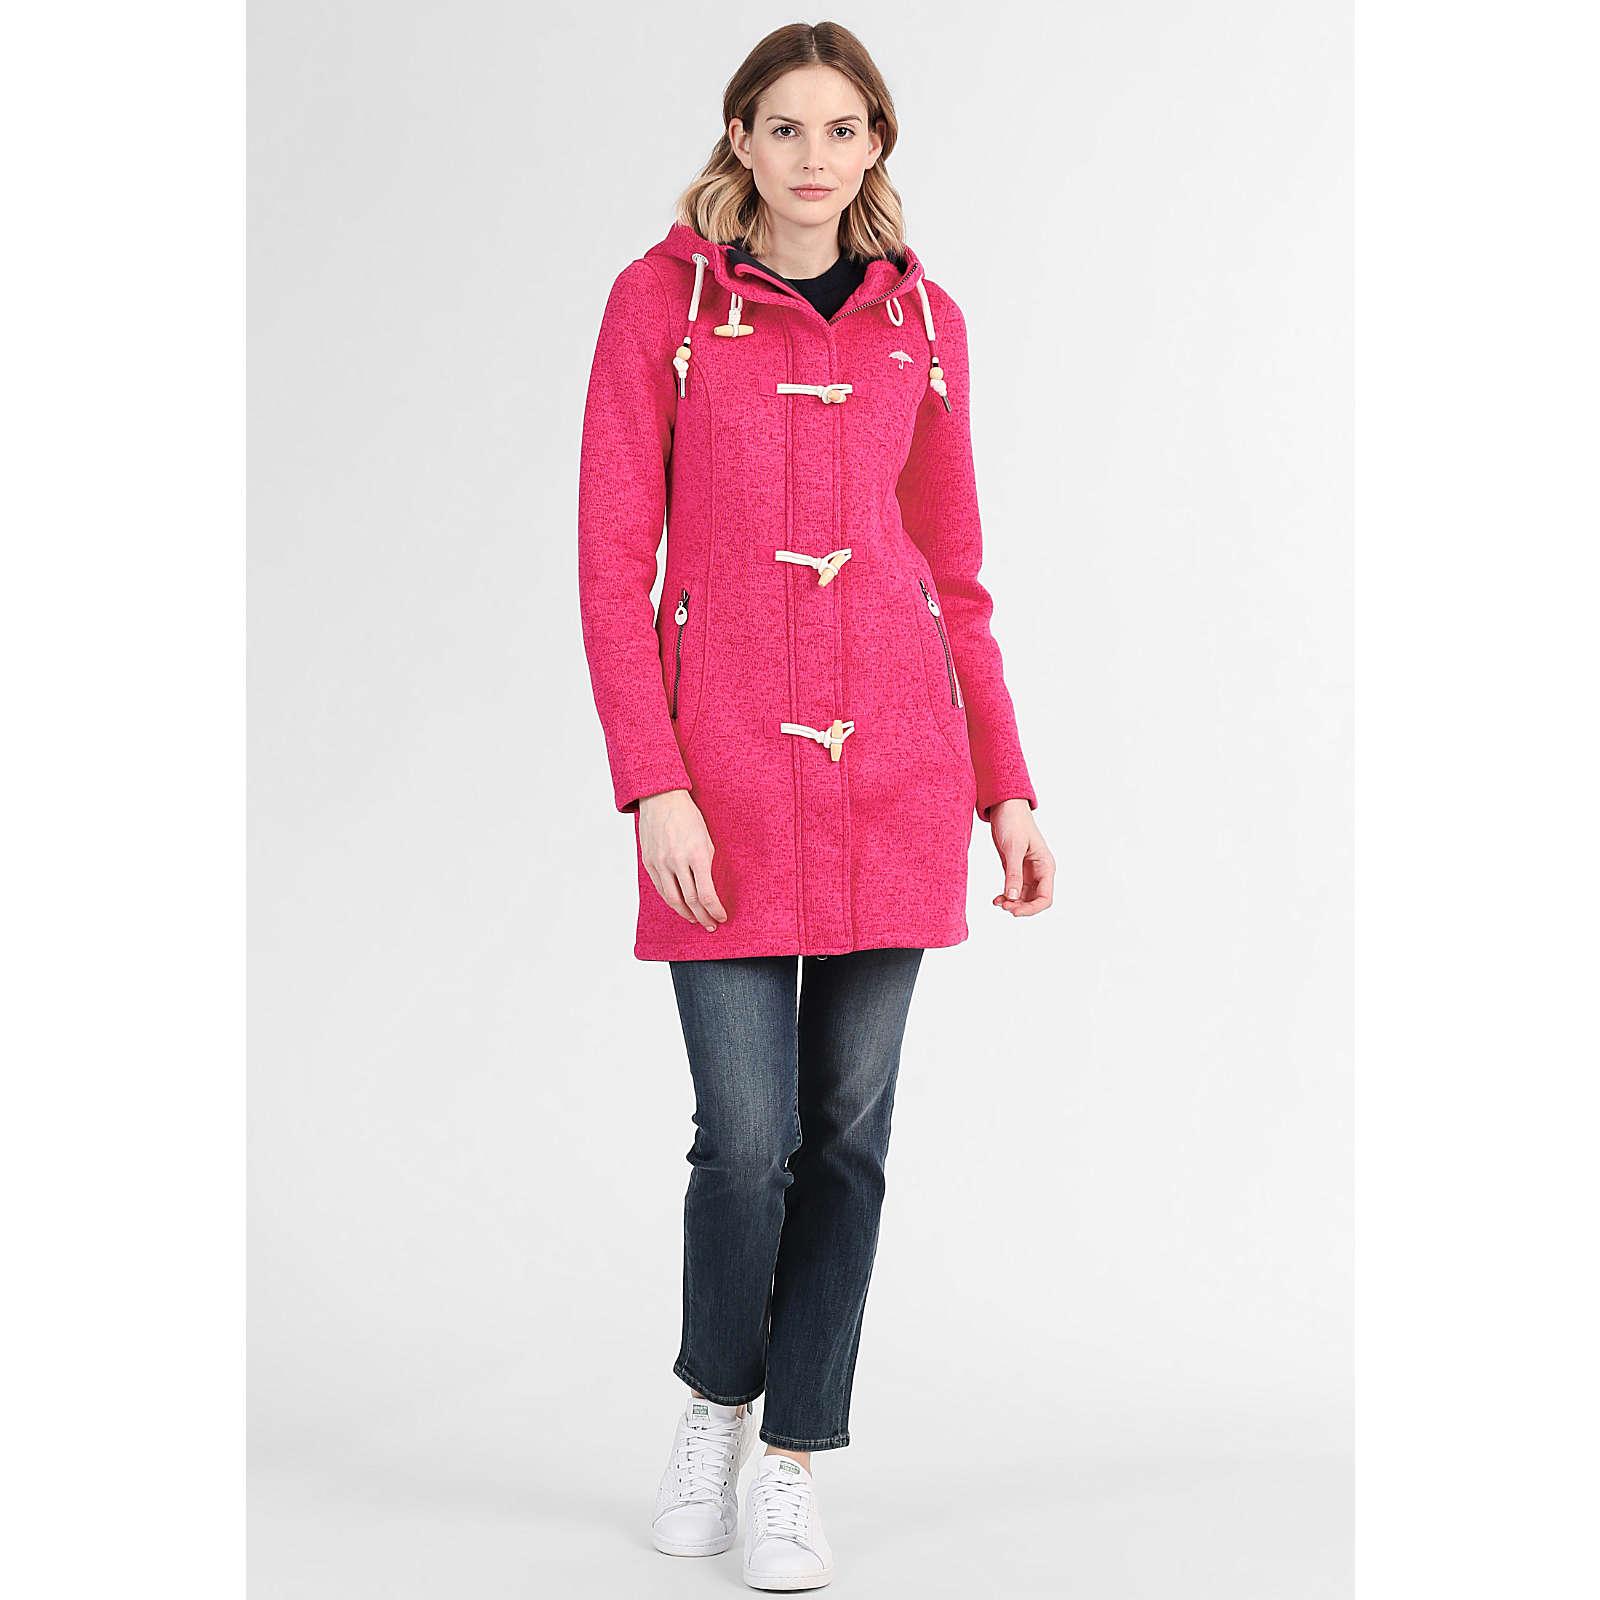 SCHMUDDELWEDDA Damen Dufflecoat pink Damen Gr. 36